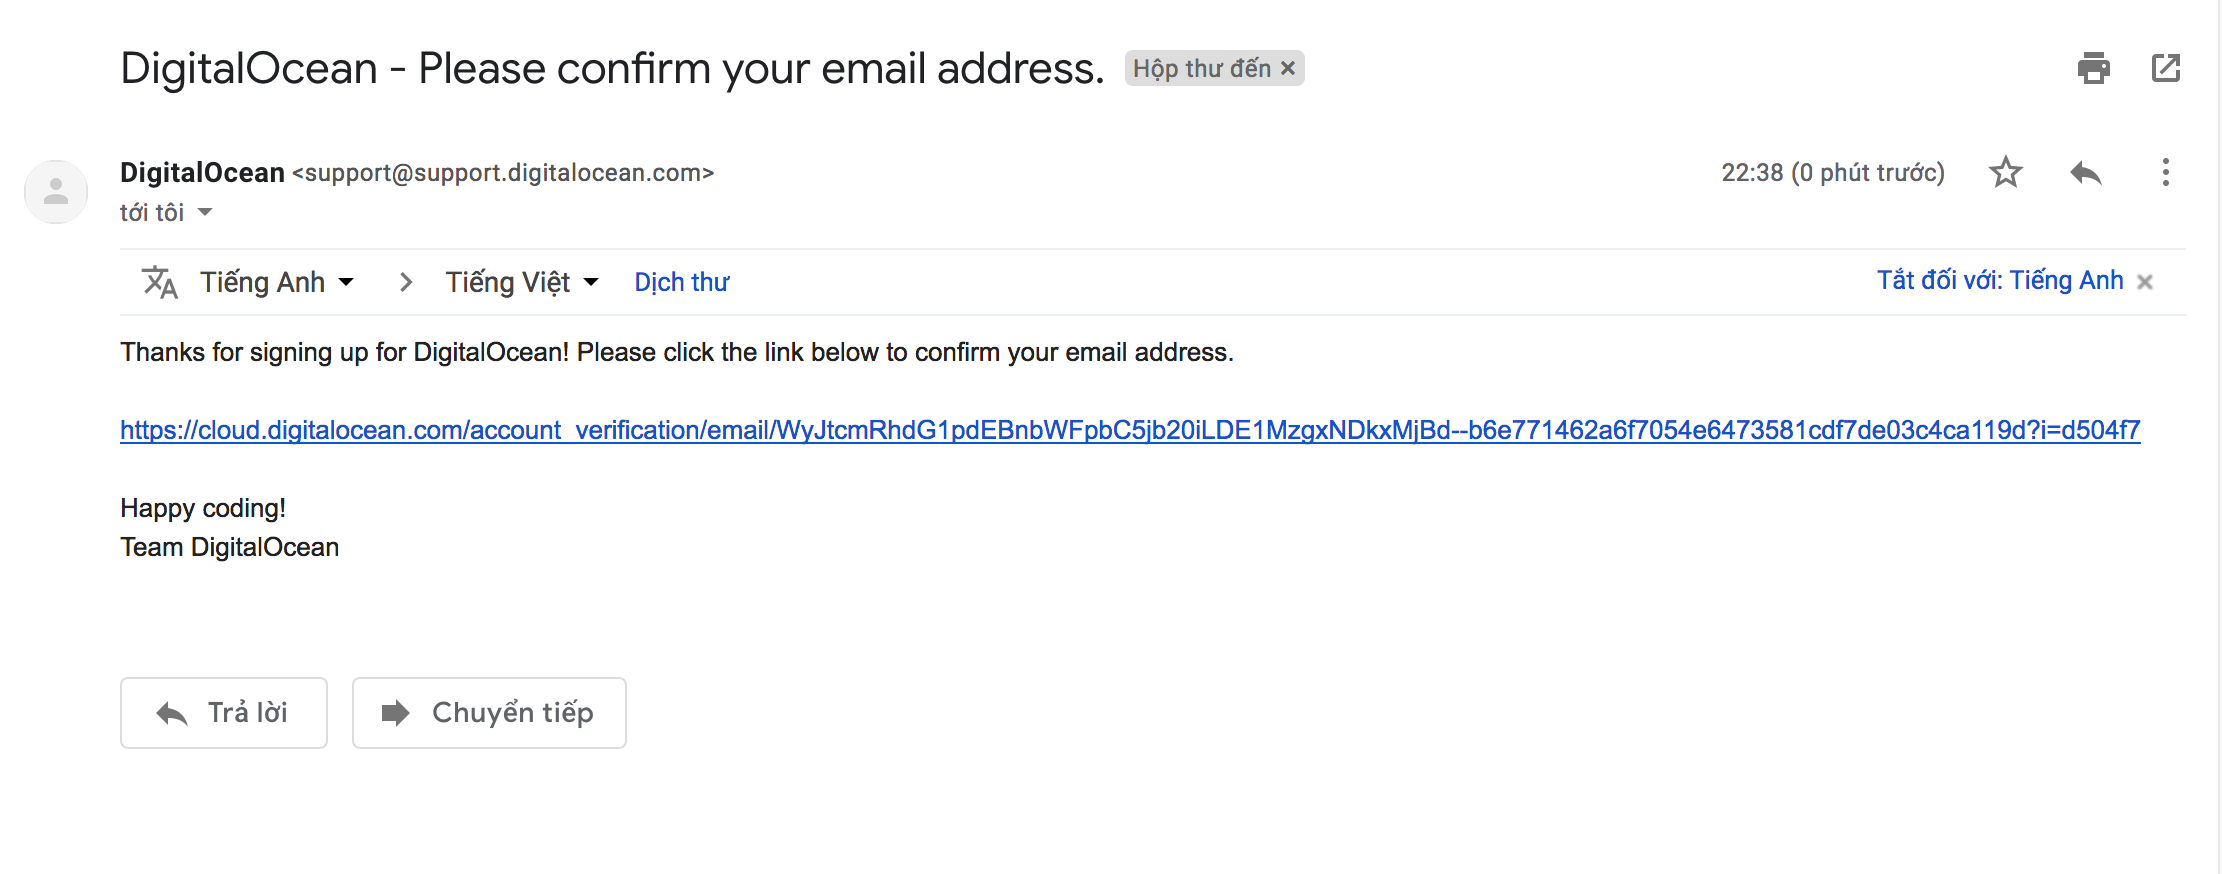 wikivps-email kích hoạt đăng ký digitalocean